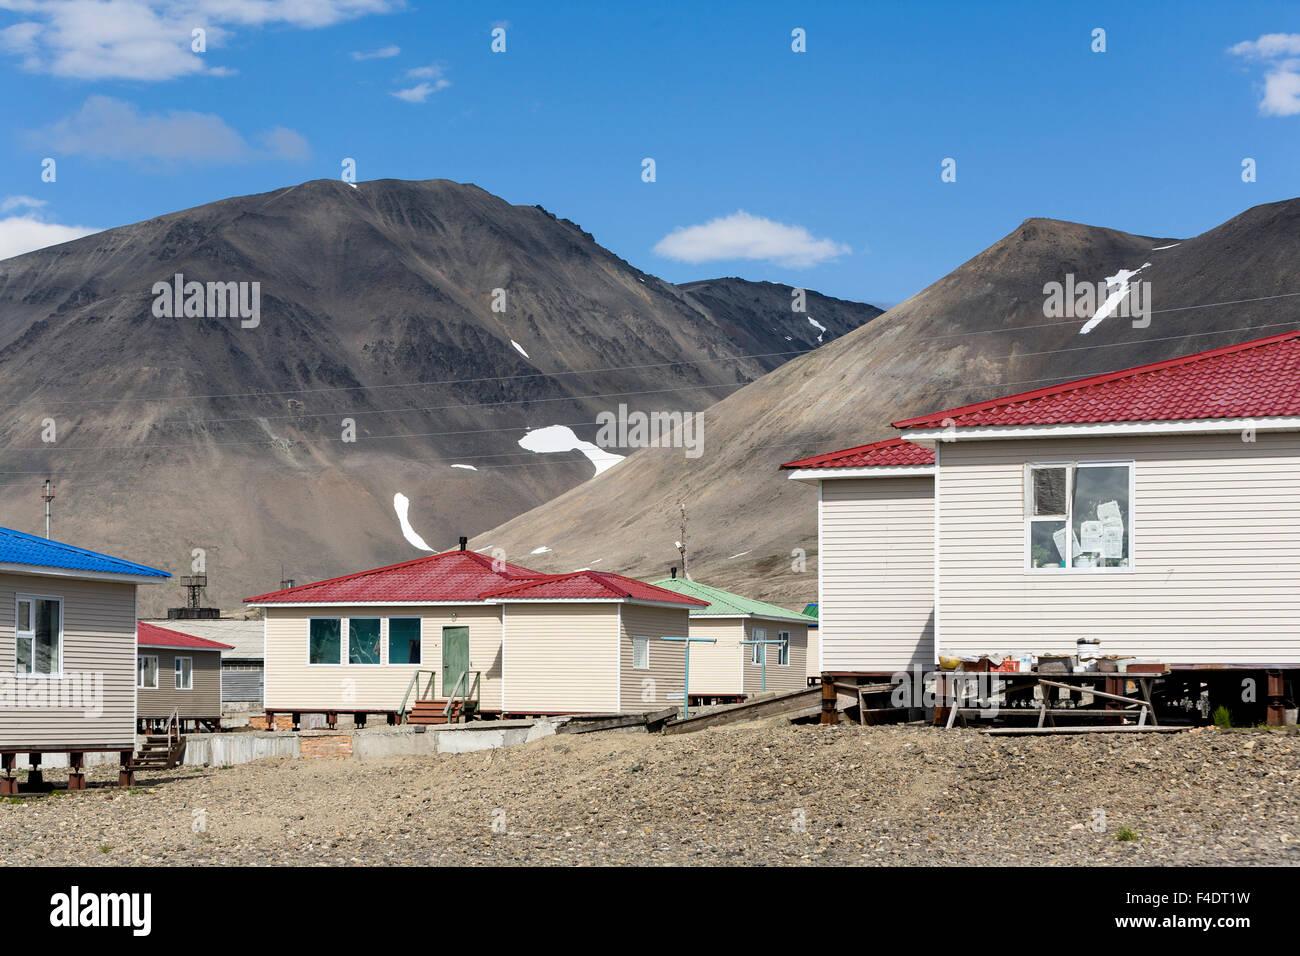 Russia, Chukotka, Chaplino Village, View of elevated prefab homes